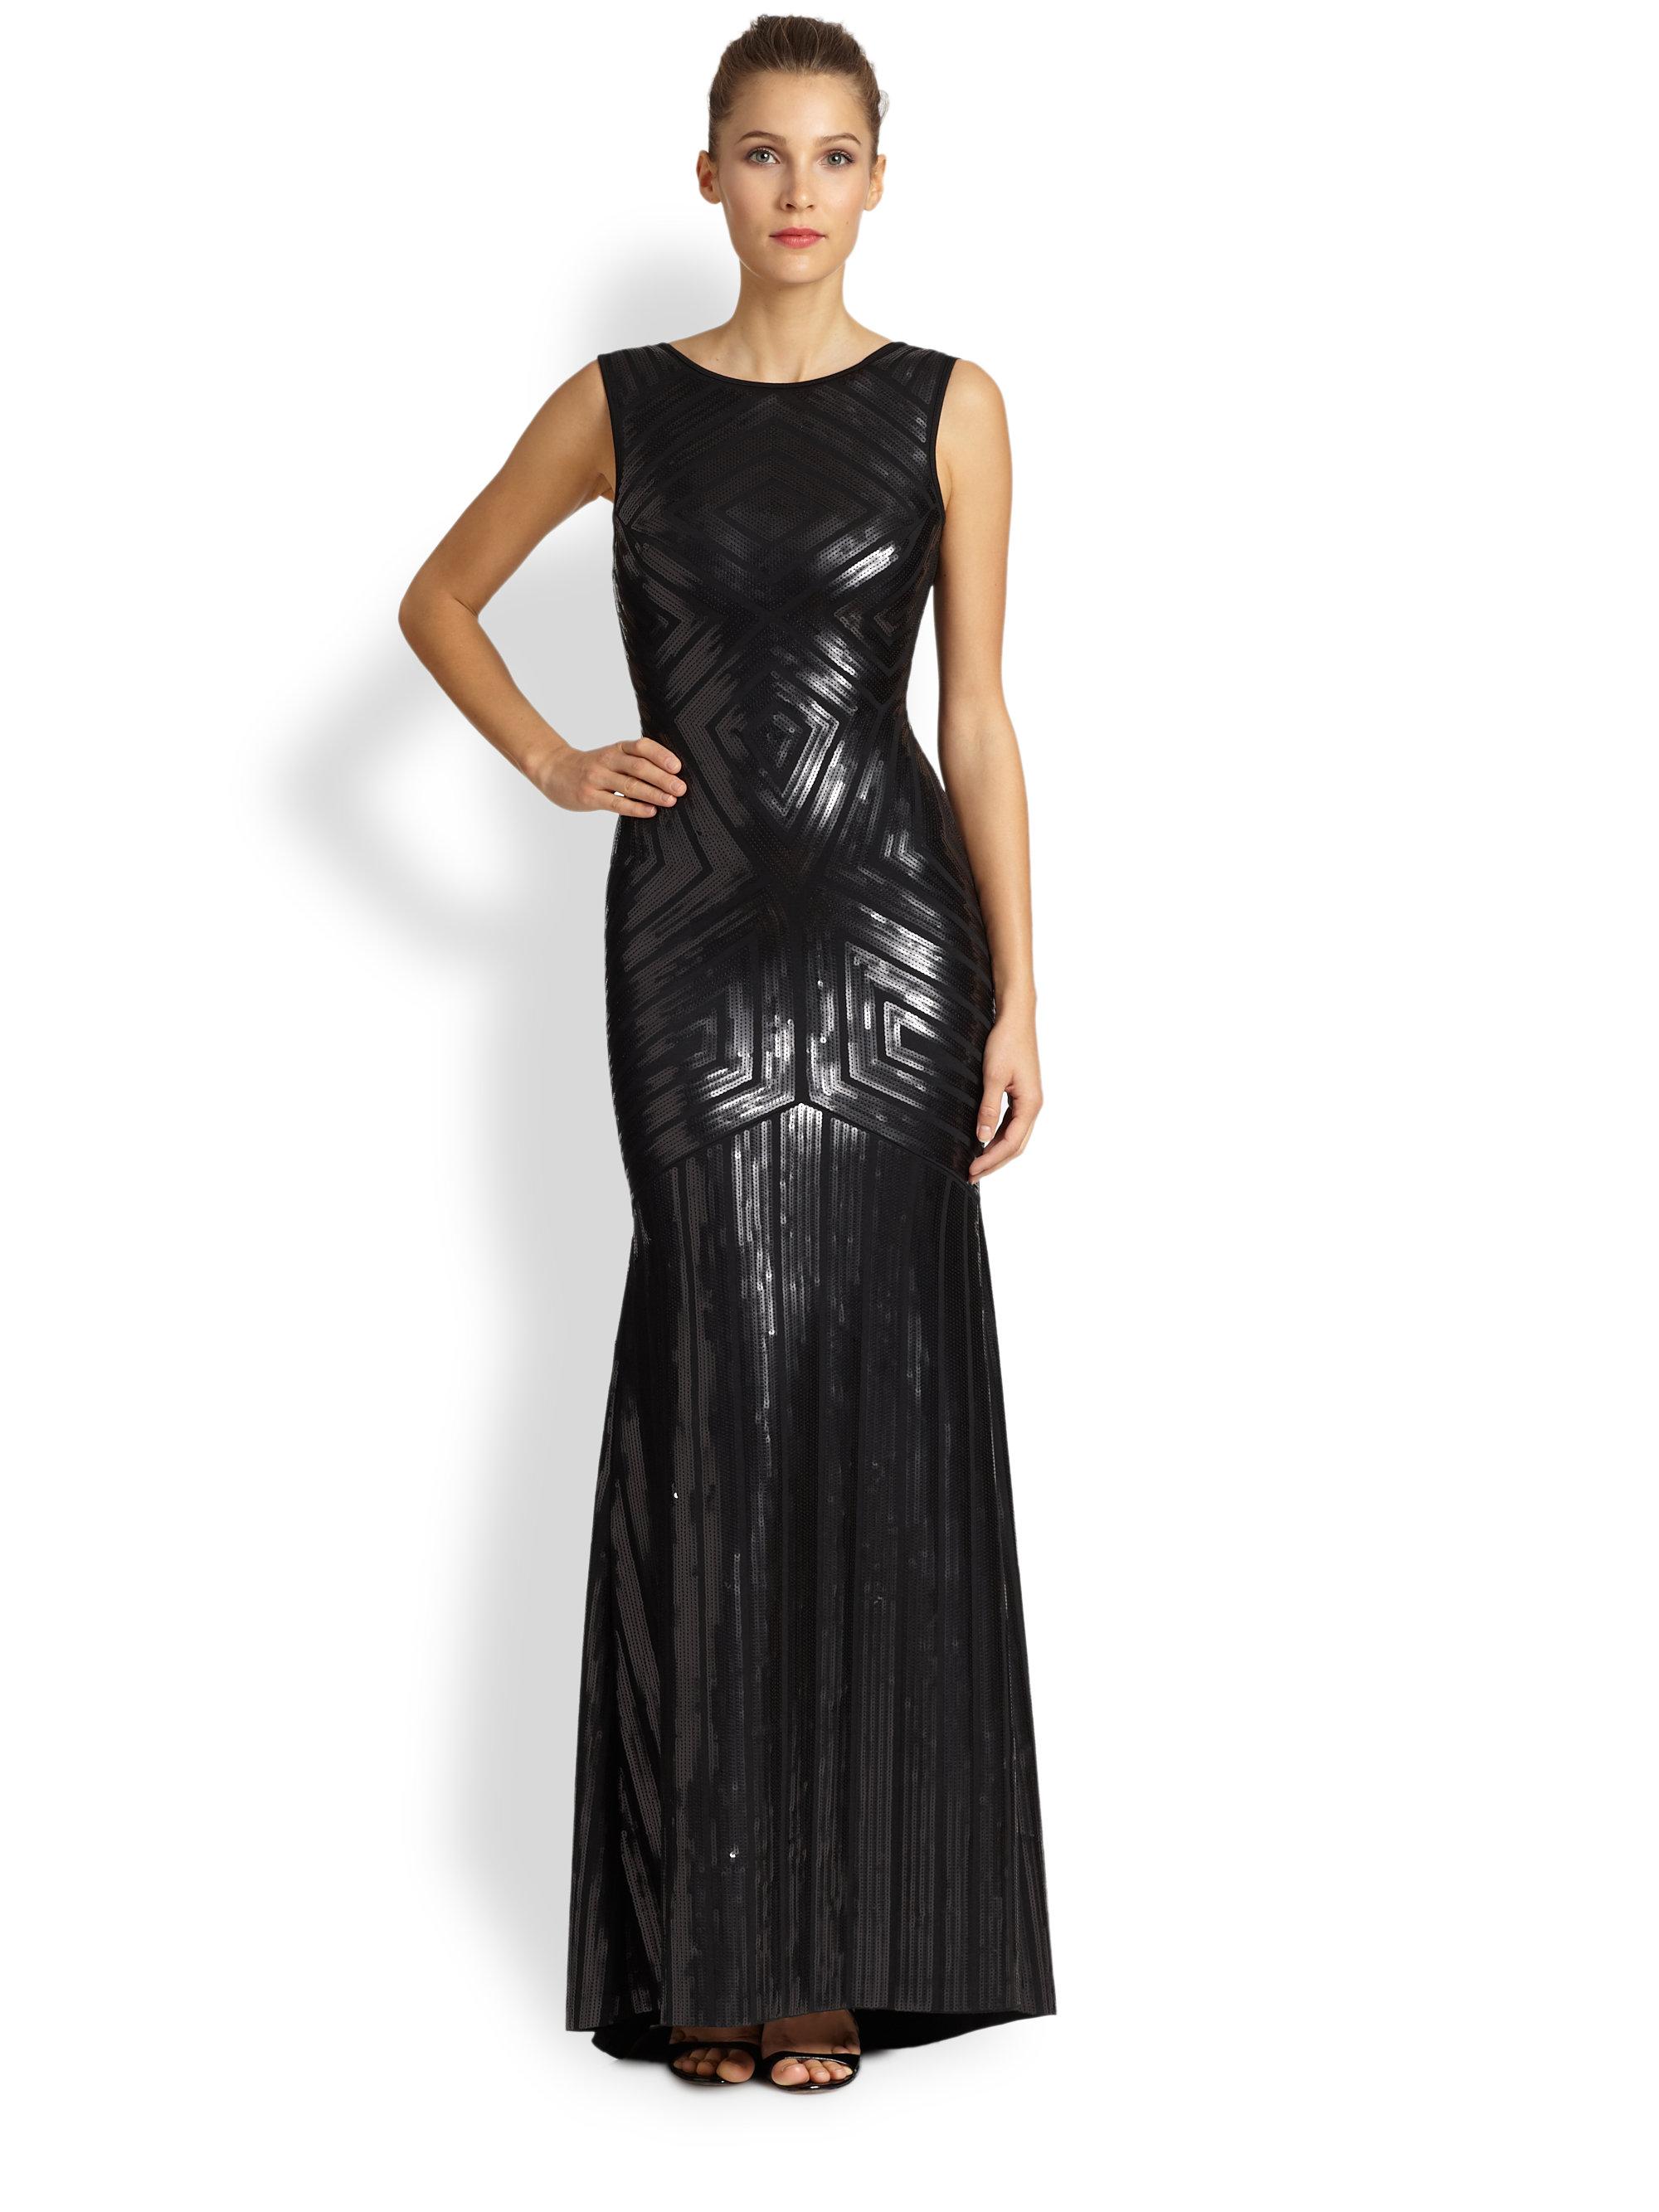 Sequin black dress long